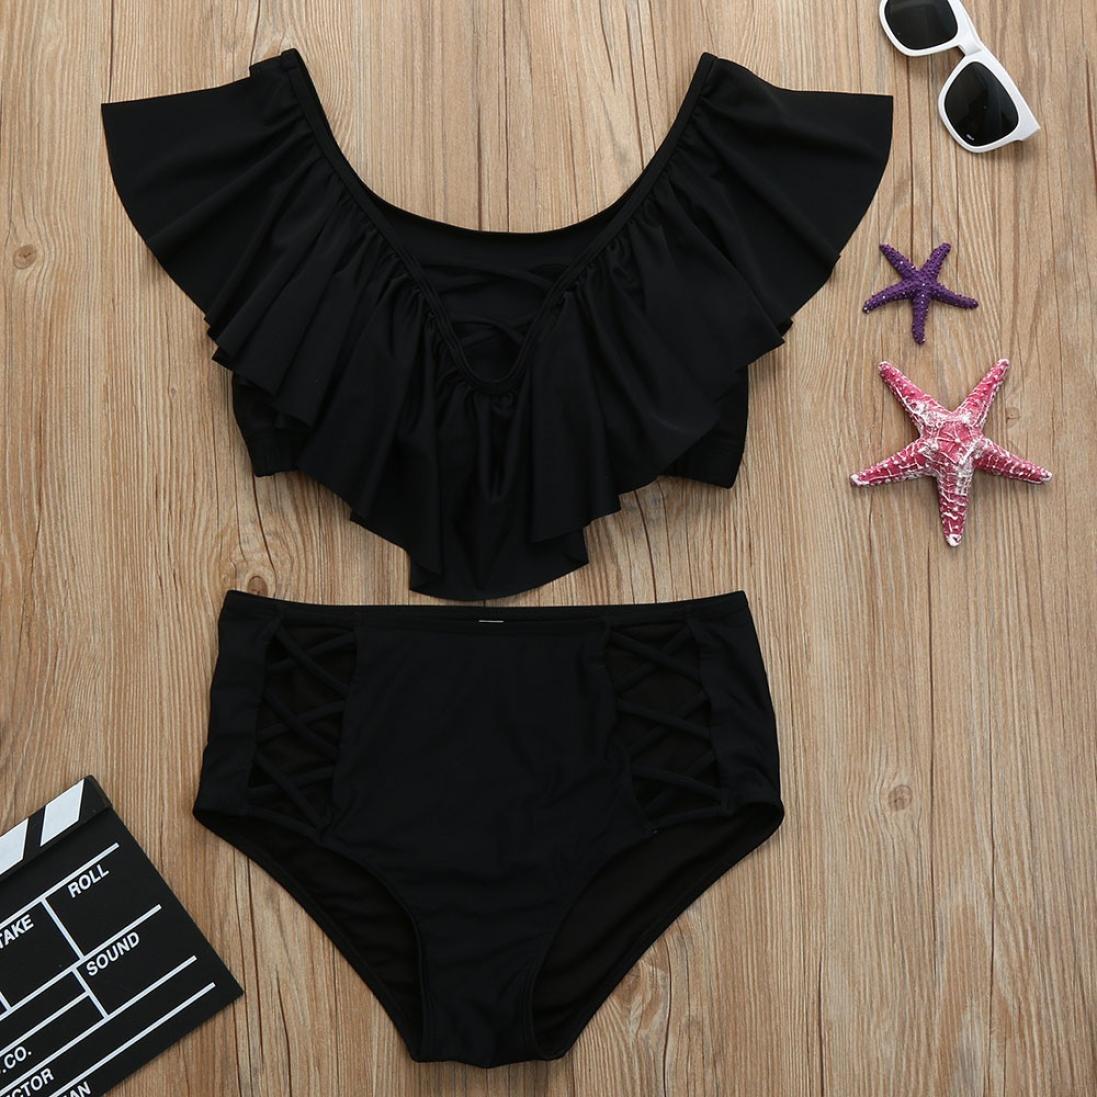 RAISINGTOP Plus Size Swimwear for Women Two Pieces Print Bathing Tankini Ruffle Top Swimsuit Off Shoulder Beachwear